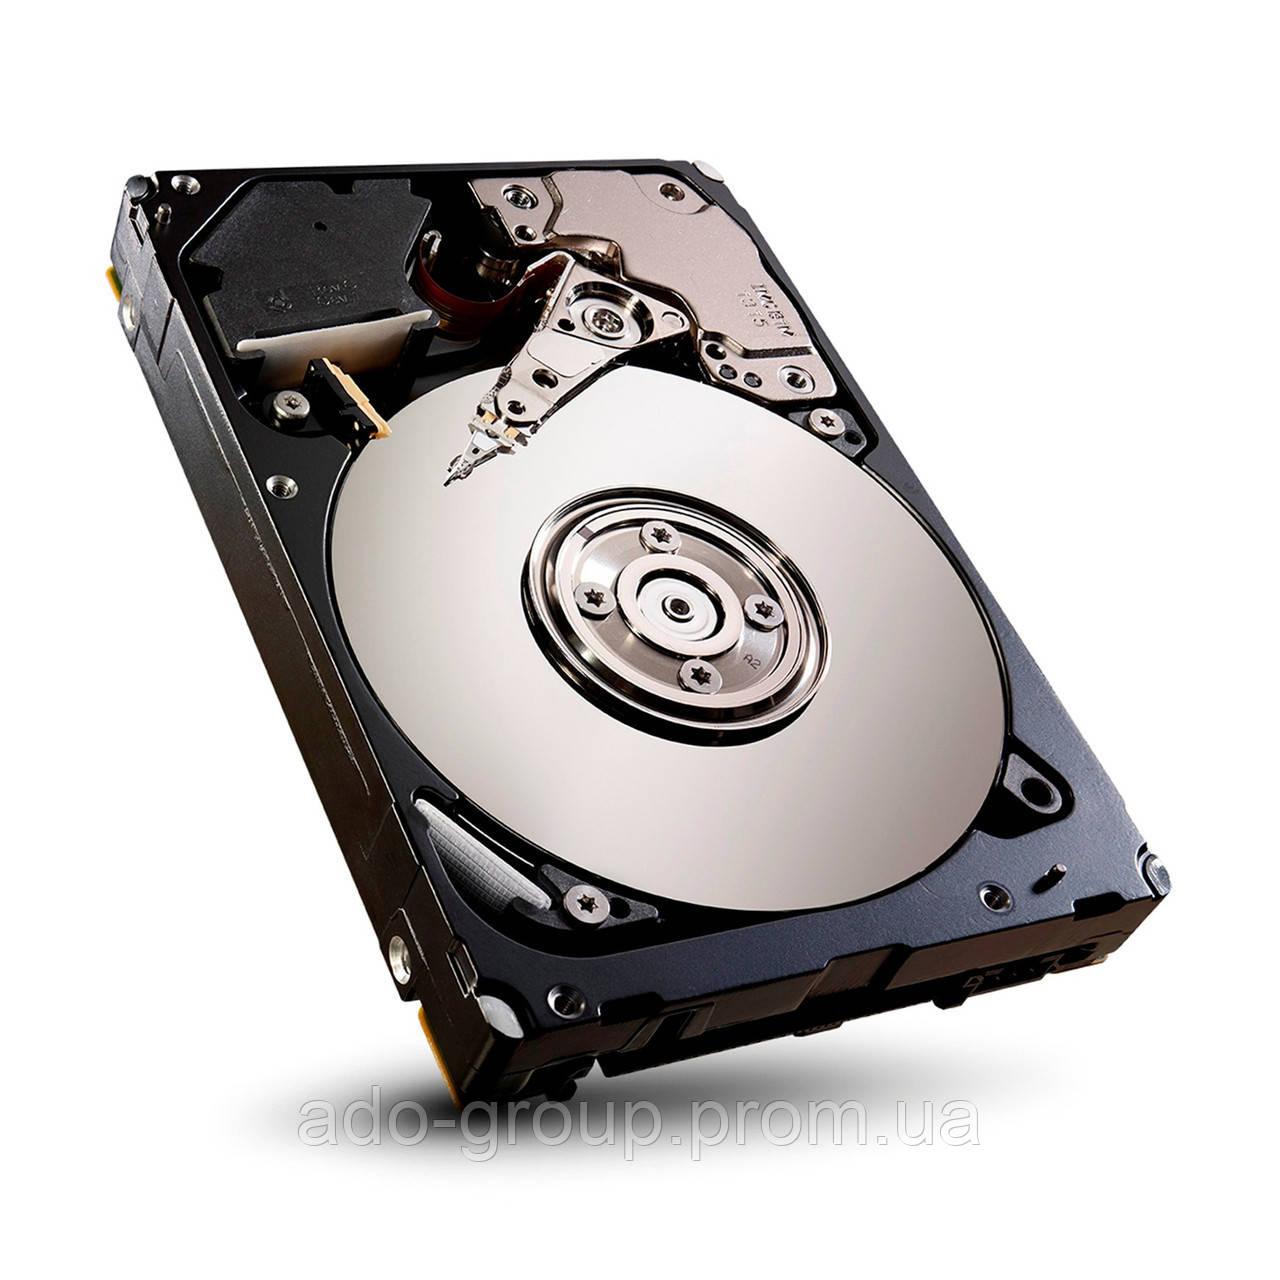 "730702-001 Жесткий диск HP 600GB SAS 10K 2.5"""